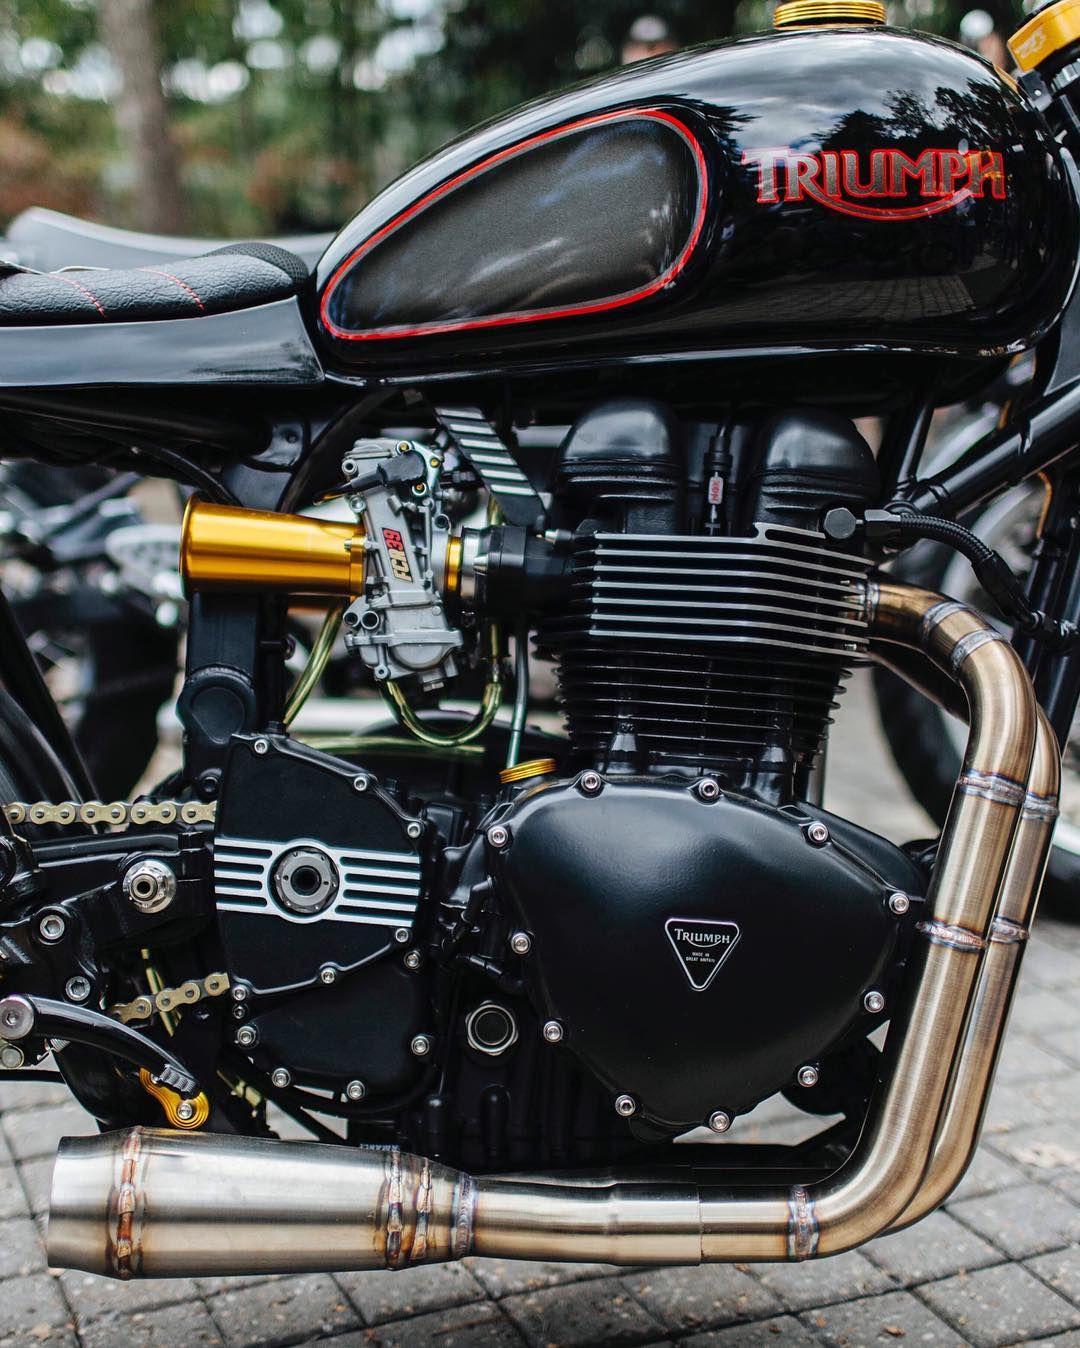 Triumph Bonneville Pre 2016 Engine Kehin Fcr Carburator Rear